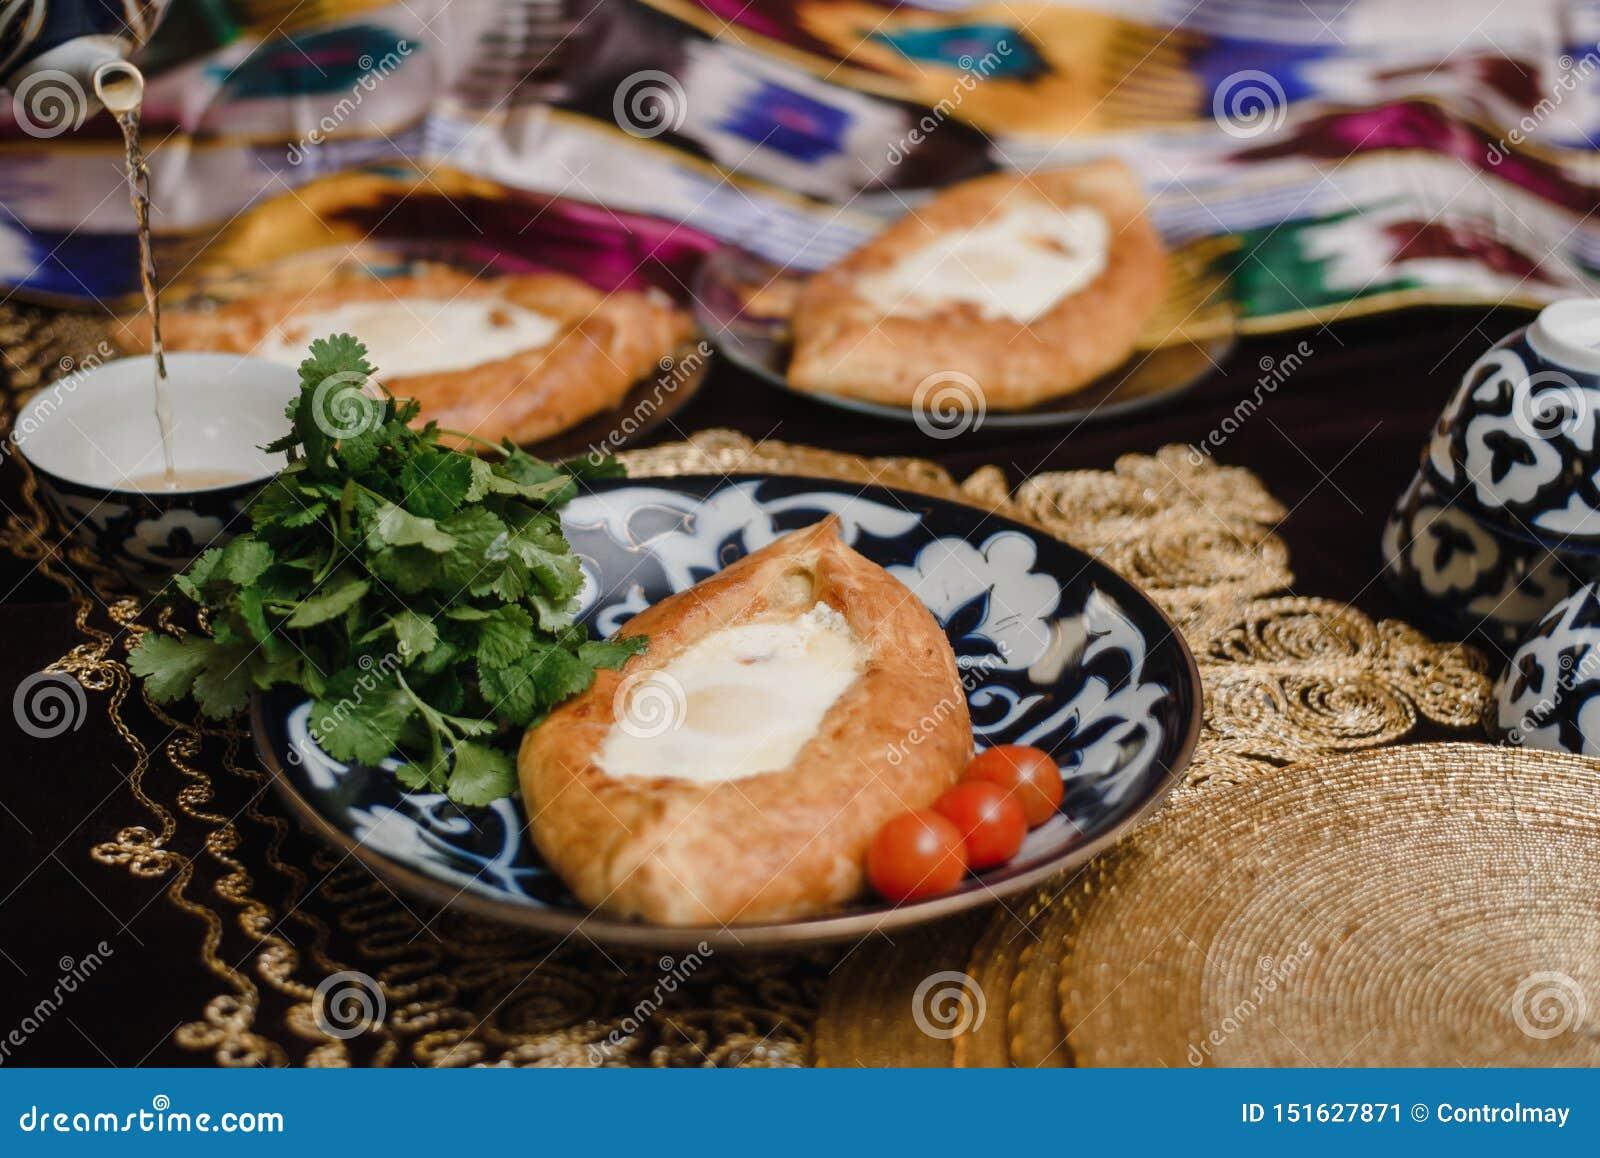 Adjara khachapuri on the eastern table. egg in hot bread on oriental plates is in a restaurant